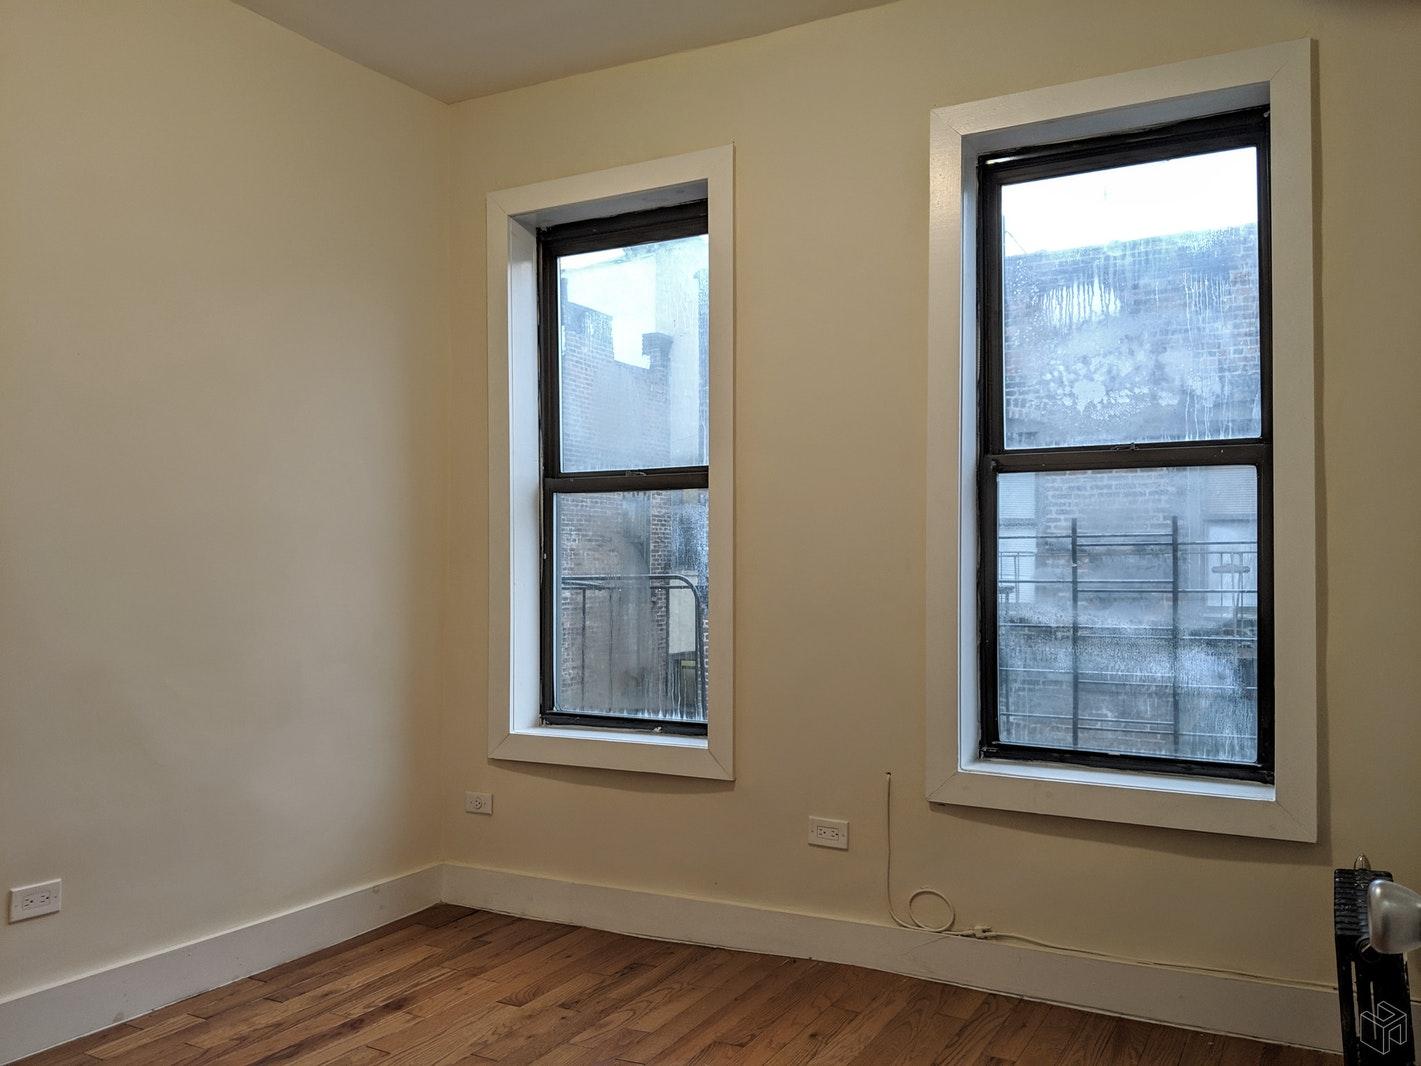 606 WEST 191ST STREET 51, Washington Heights, $2,295, Web #: 19191830